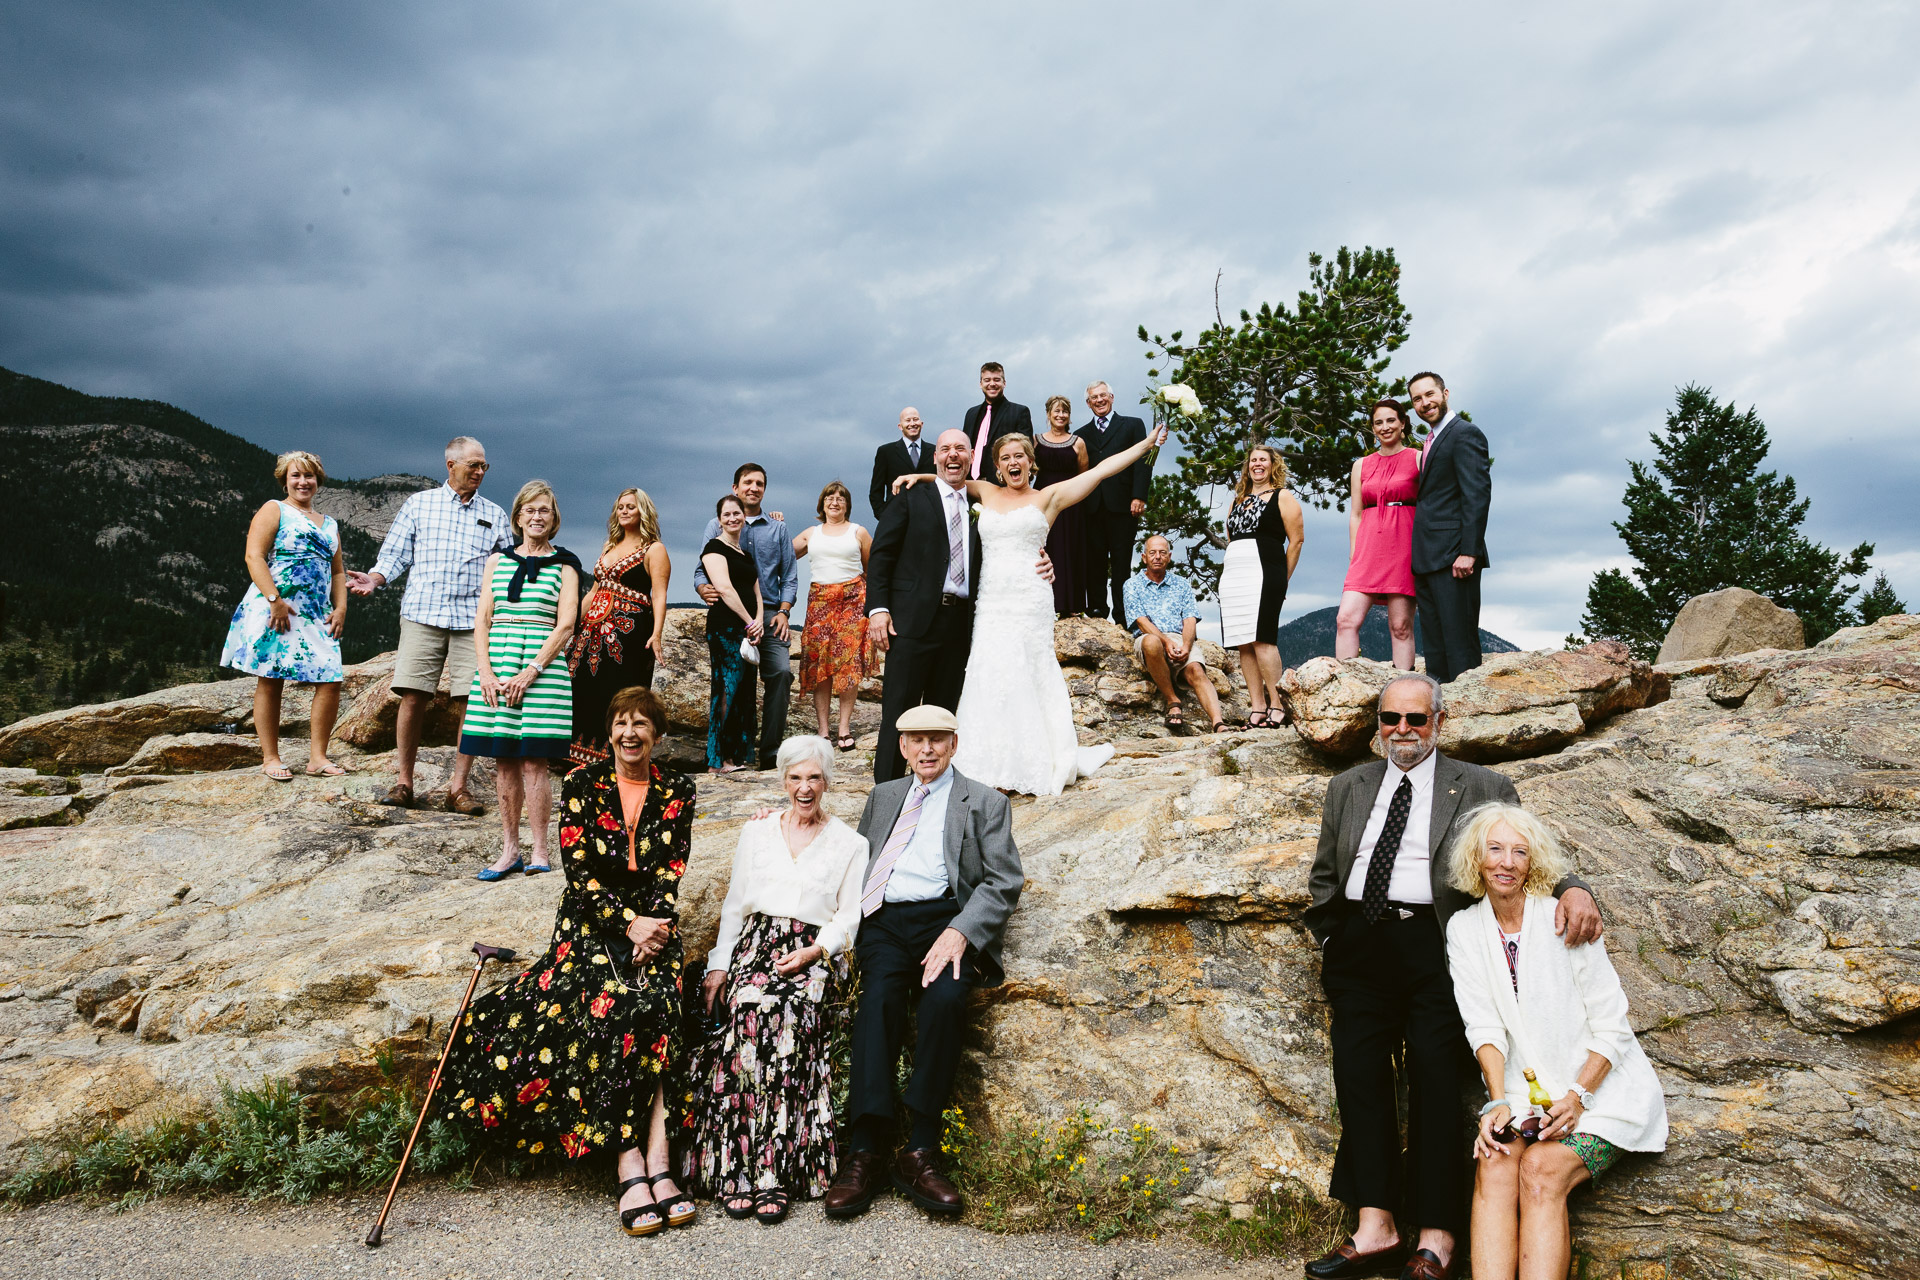 Rocky-Mountain-National-Park-Wedding-Photography-Alayna-Mark-375